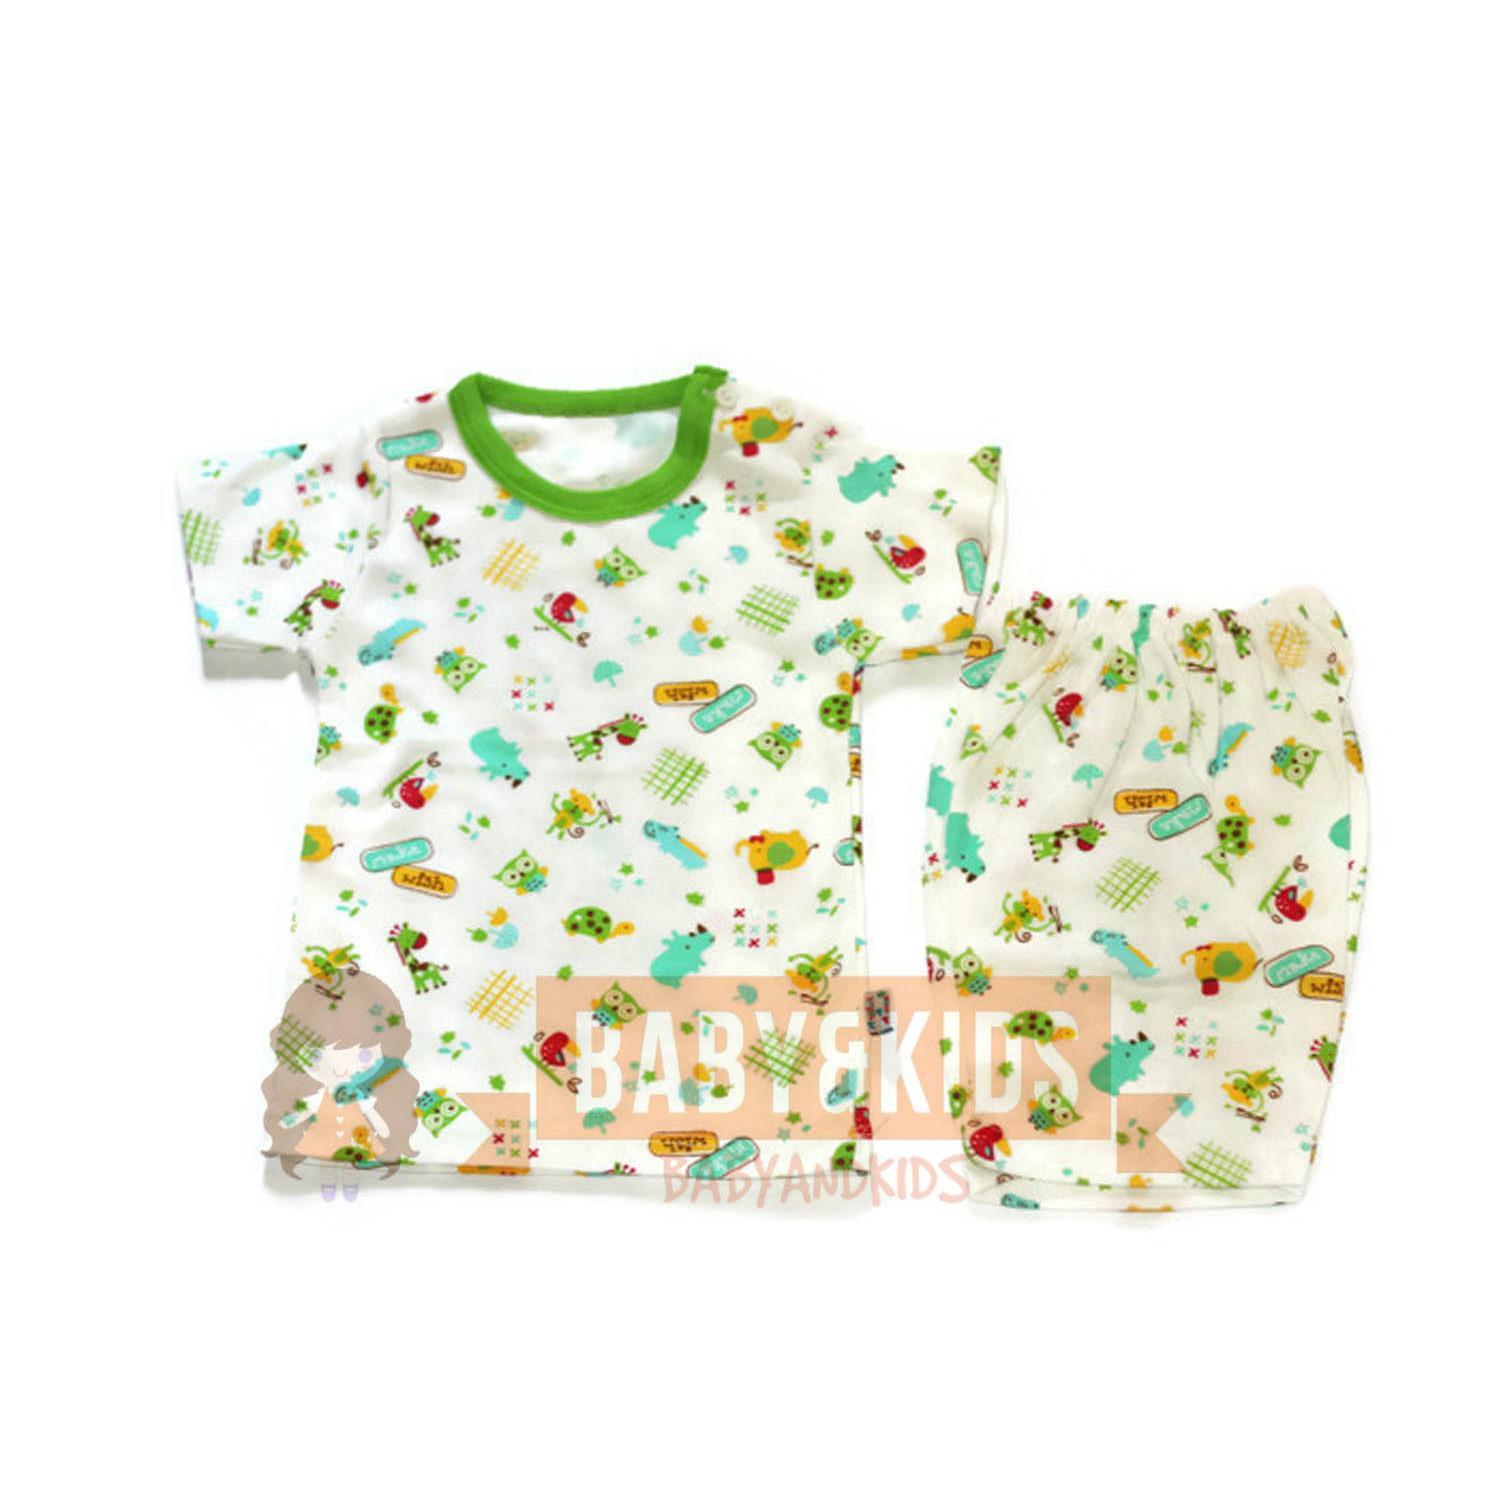 ... Bajuanakanak Paket Hemat Jumper Bayi Setelan Anak baju Newborn Murah - 4